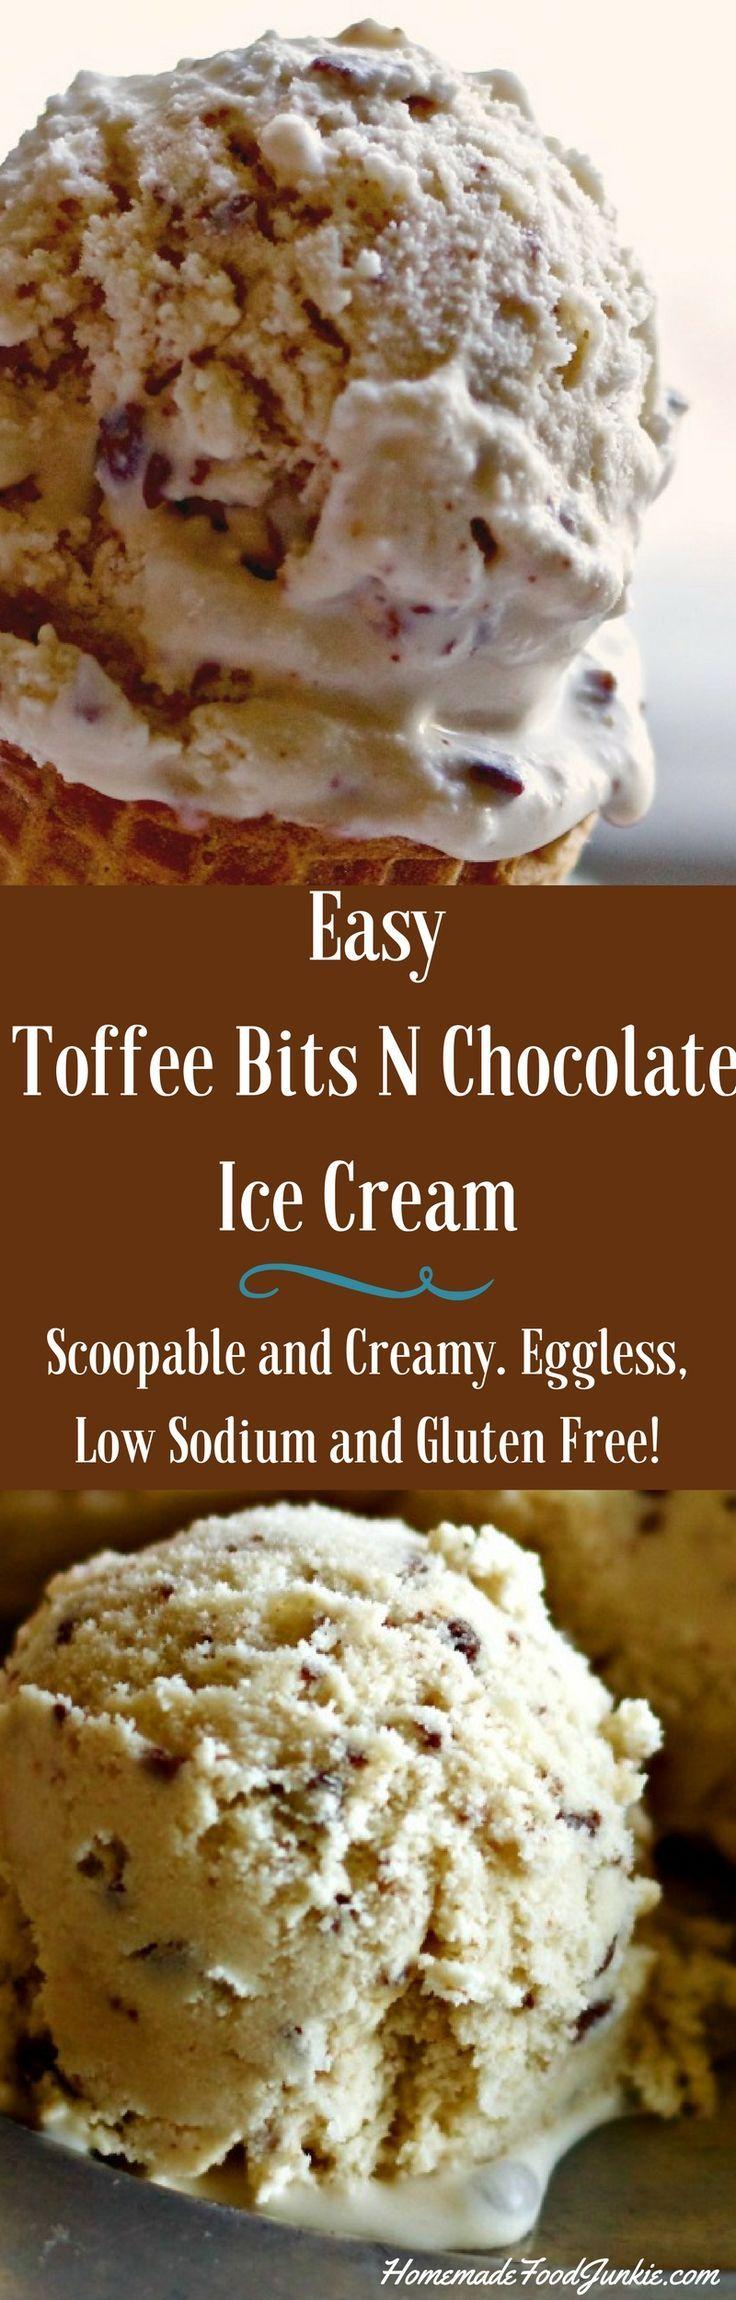 Easy Toffee Bits N Chocolate Ice Cream Recipe isQuick N easy low sodium, eggless…